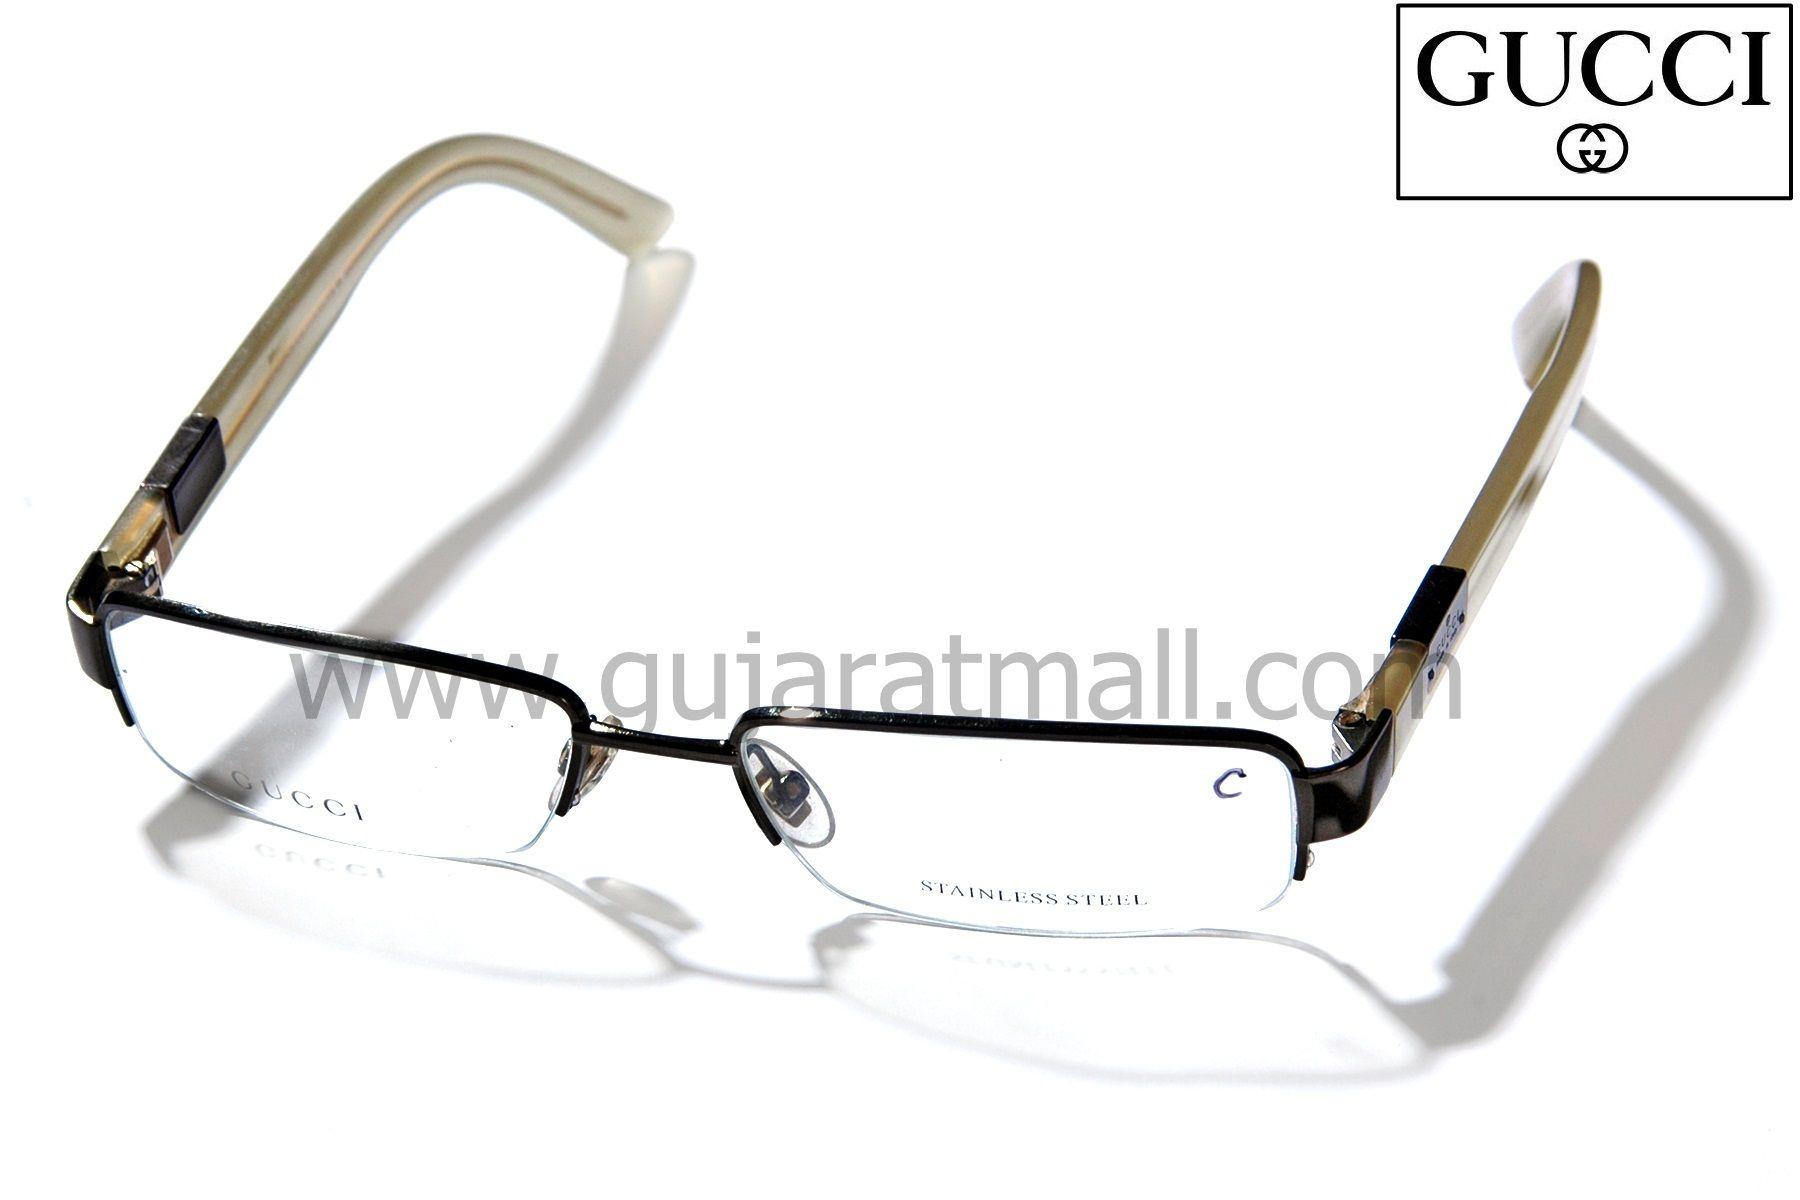 2e16376d82 Buy Gucci GG1875 Eyeglasses Spectacle Frame Eyeglasses India •  GujaratMall.com